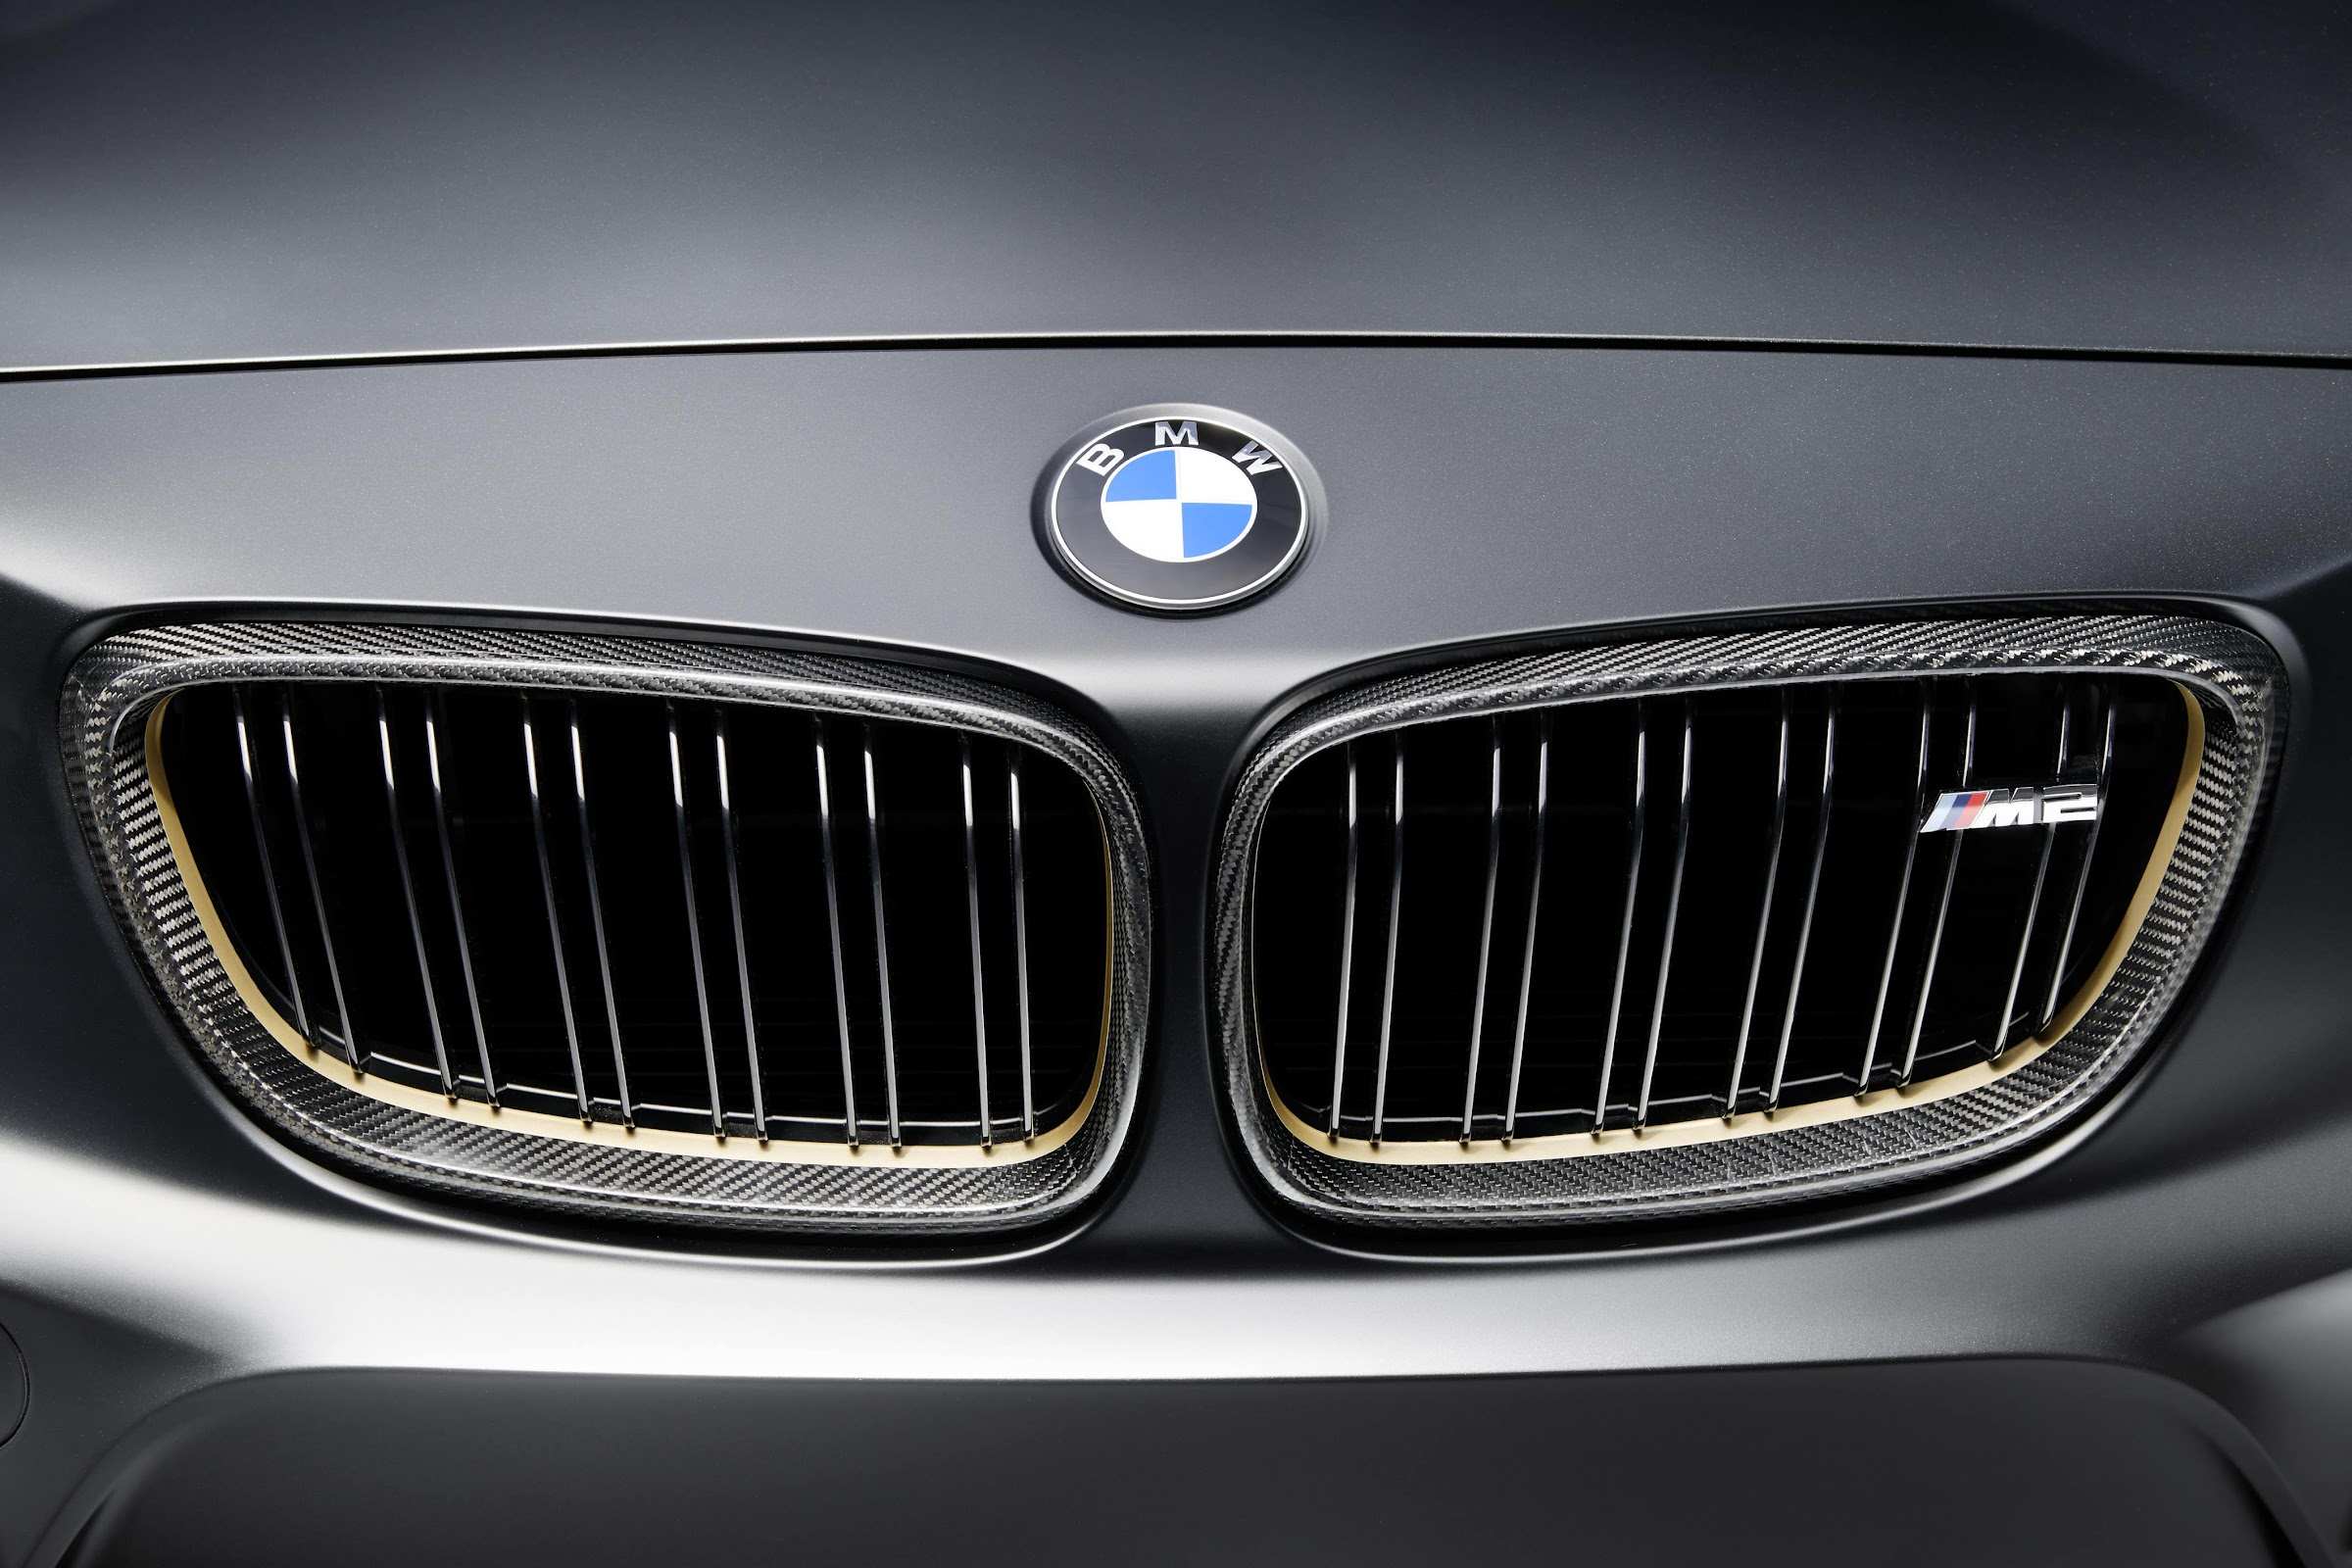 PxVwPgwSqpVLvuvNbQg4RoXWDuJN39uEdoaQ0zruRfVR5jXmIja11eI2ctaEtyUpp7 zpb0 is jlUdPz5ffgkhWuIxdlnjx QGovtTfcE9Sa1 bOriBpAXylRaiBzDttuj ugju8Q=w2400 - Nuevo BMW M Performance Parts Concept